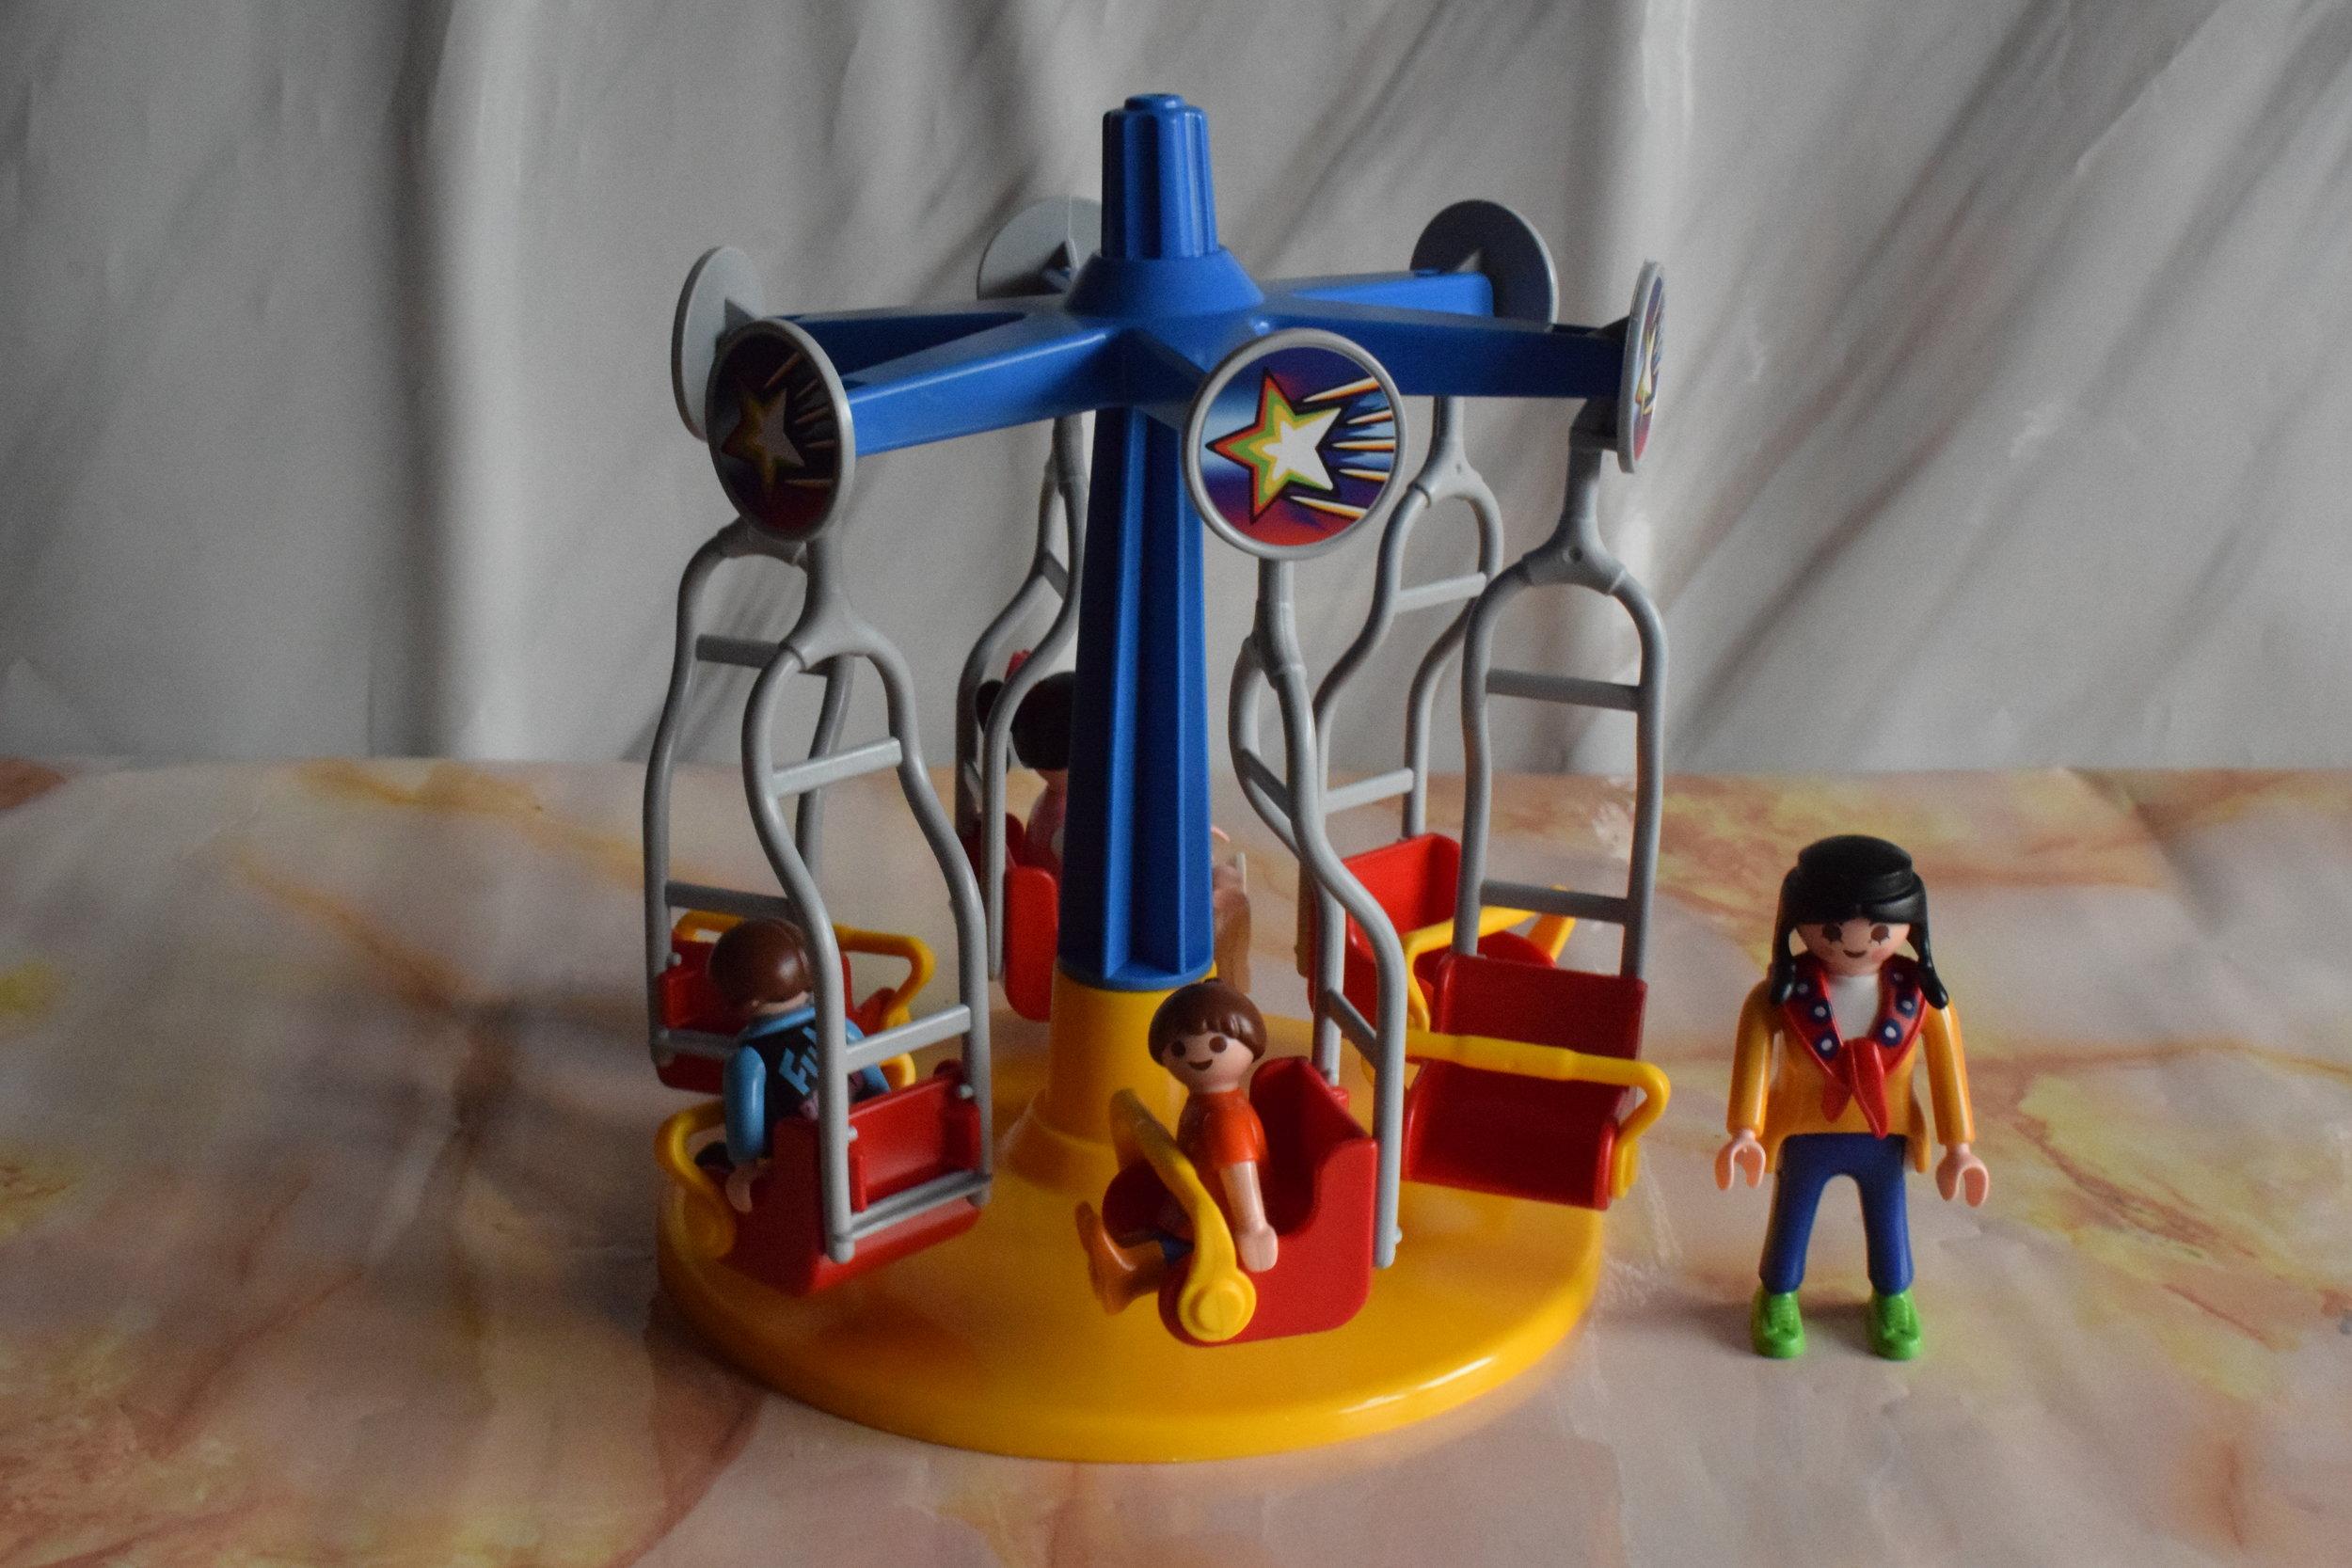 Playmobil City Life 5024 Children's Playground set